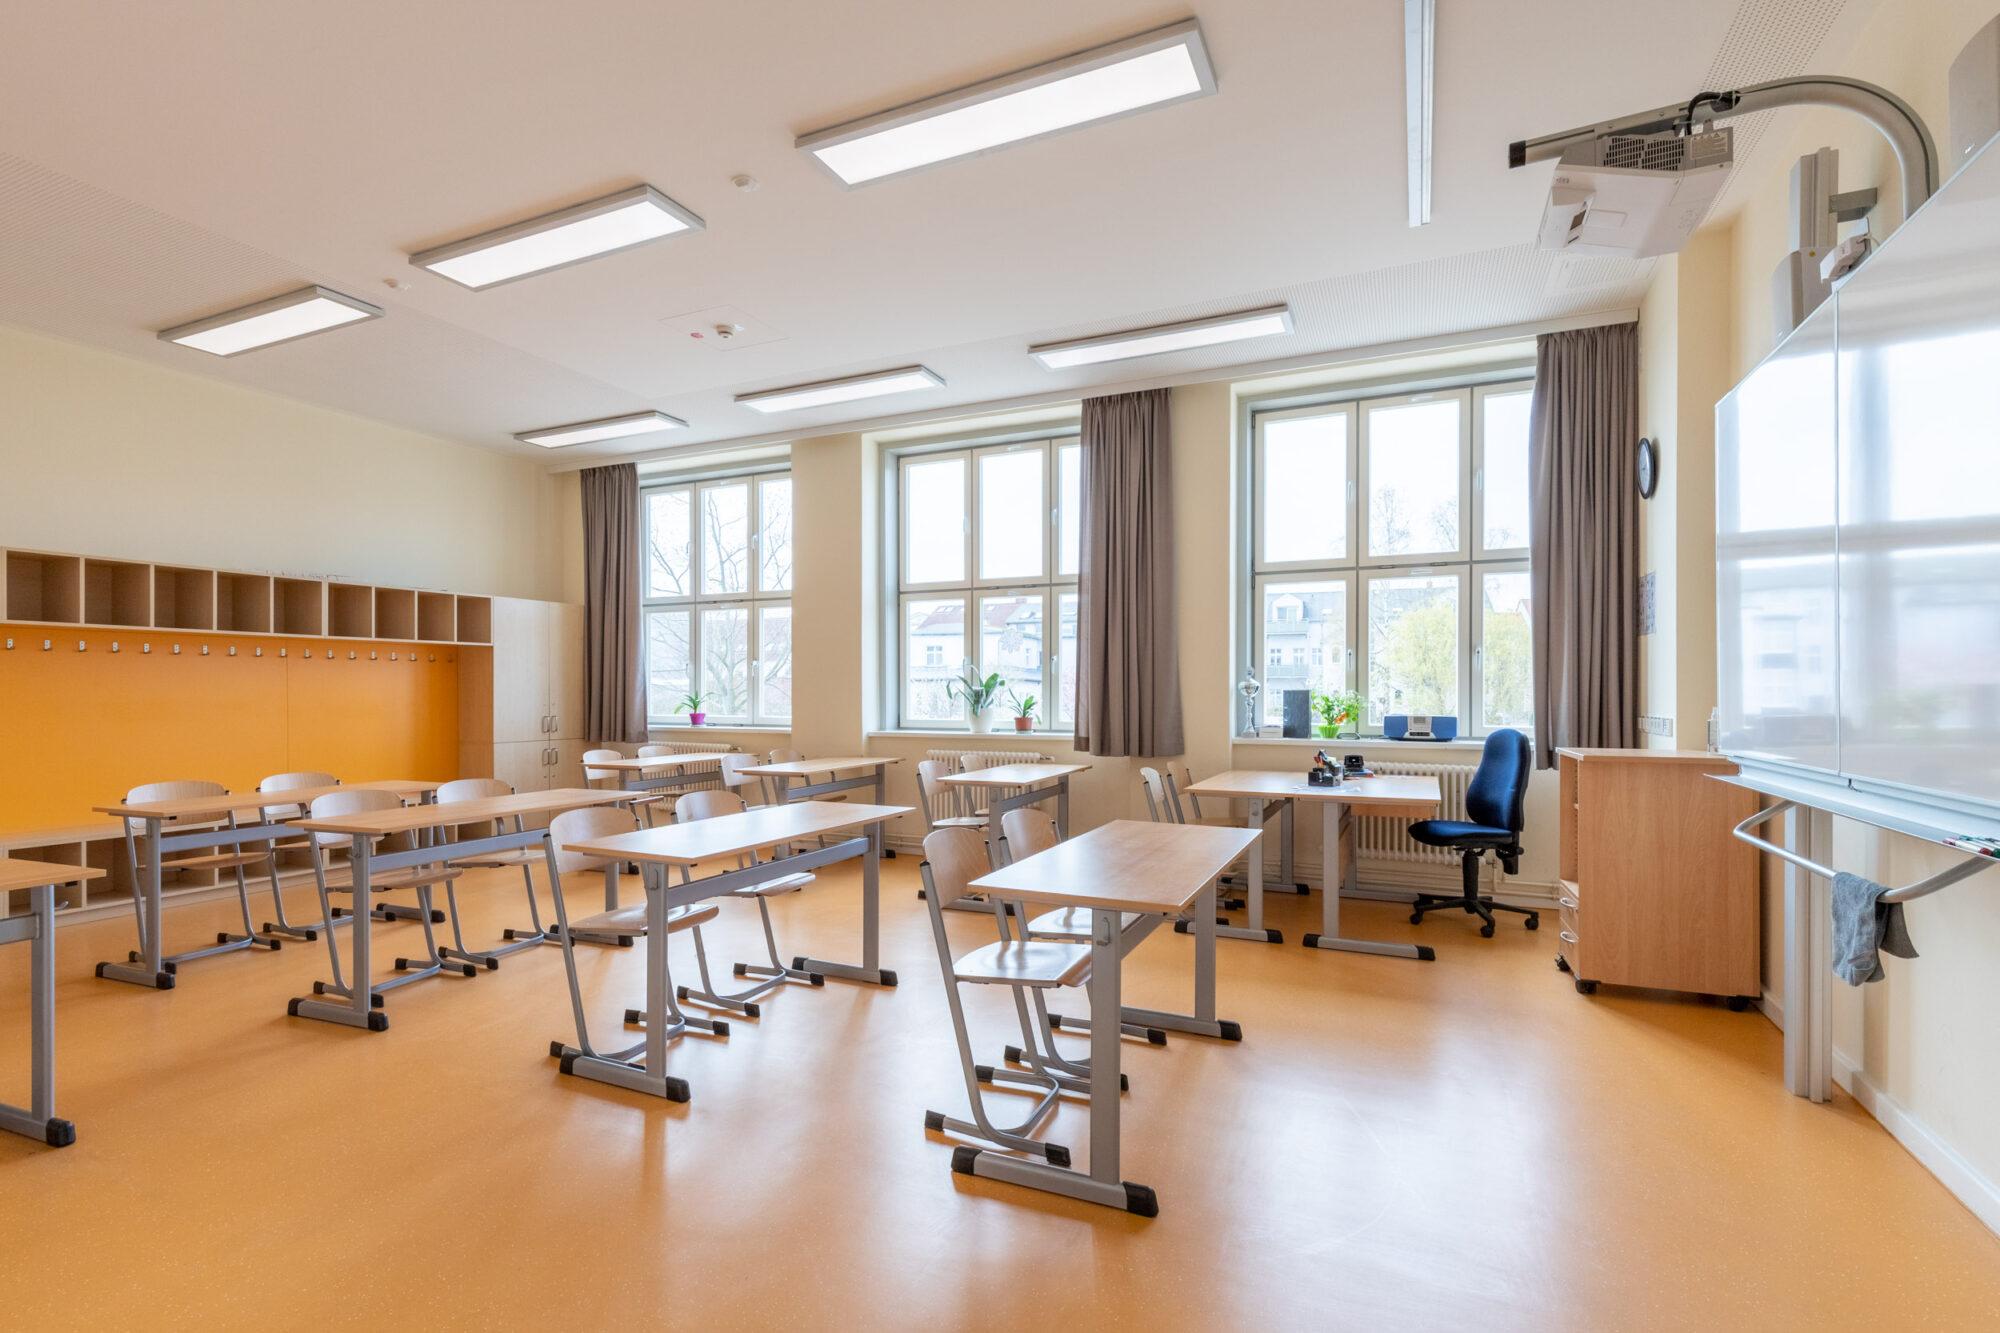 EMA Schule - Renovierter Klassenraum